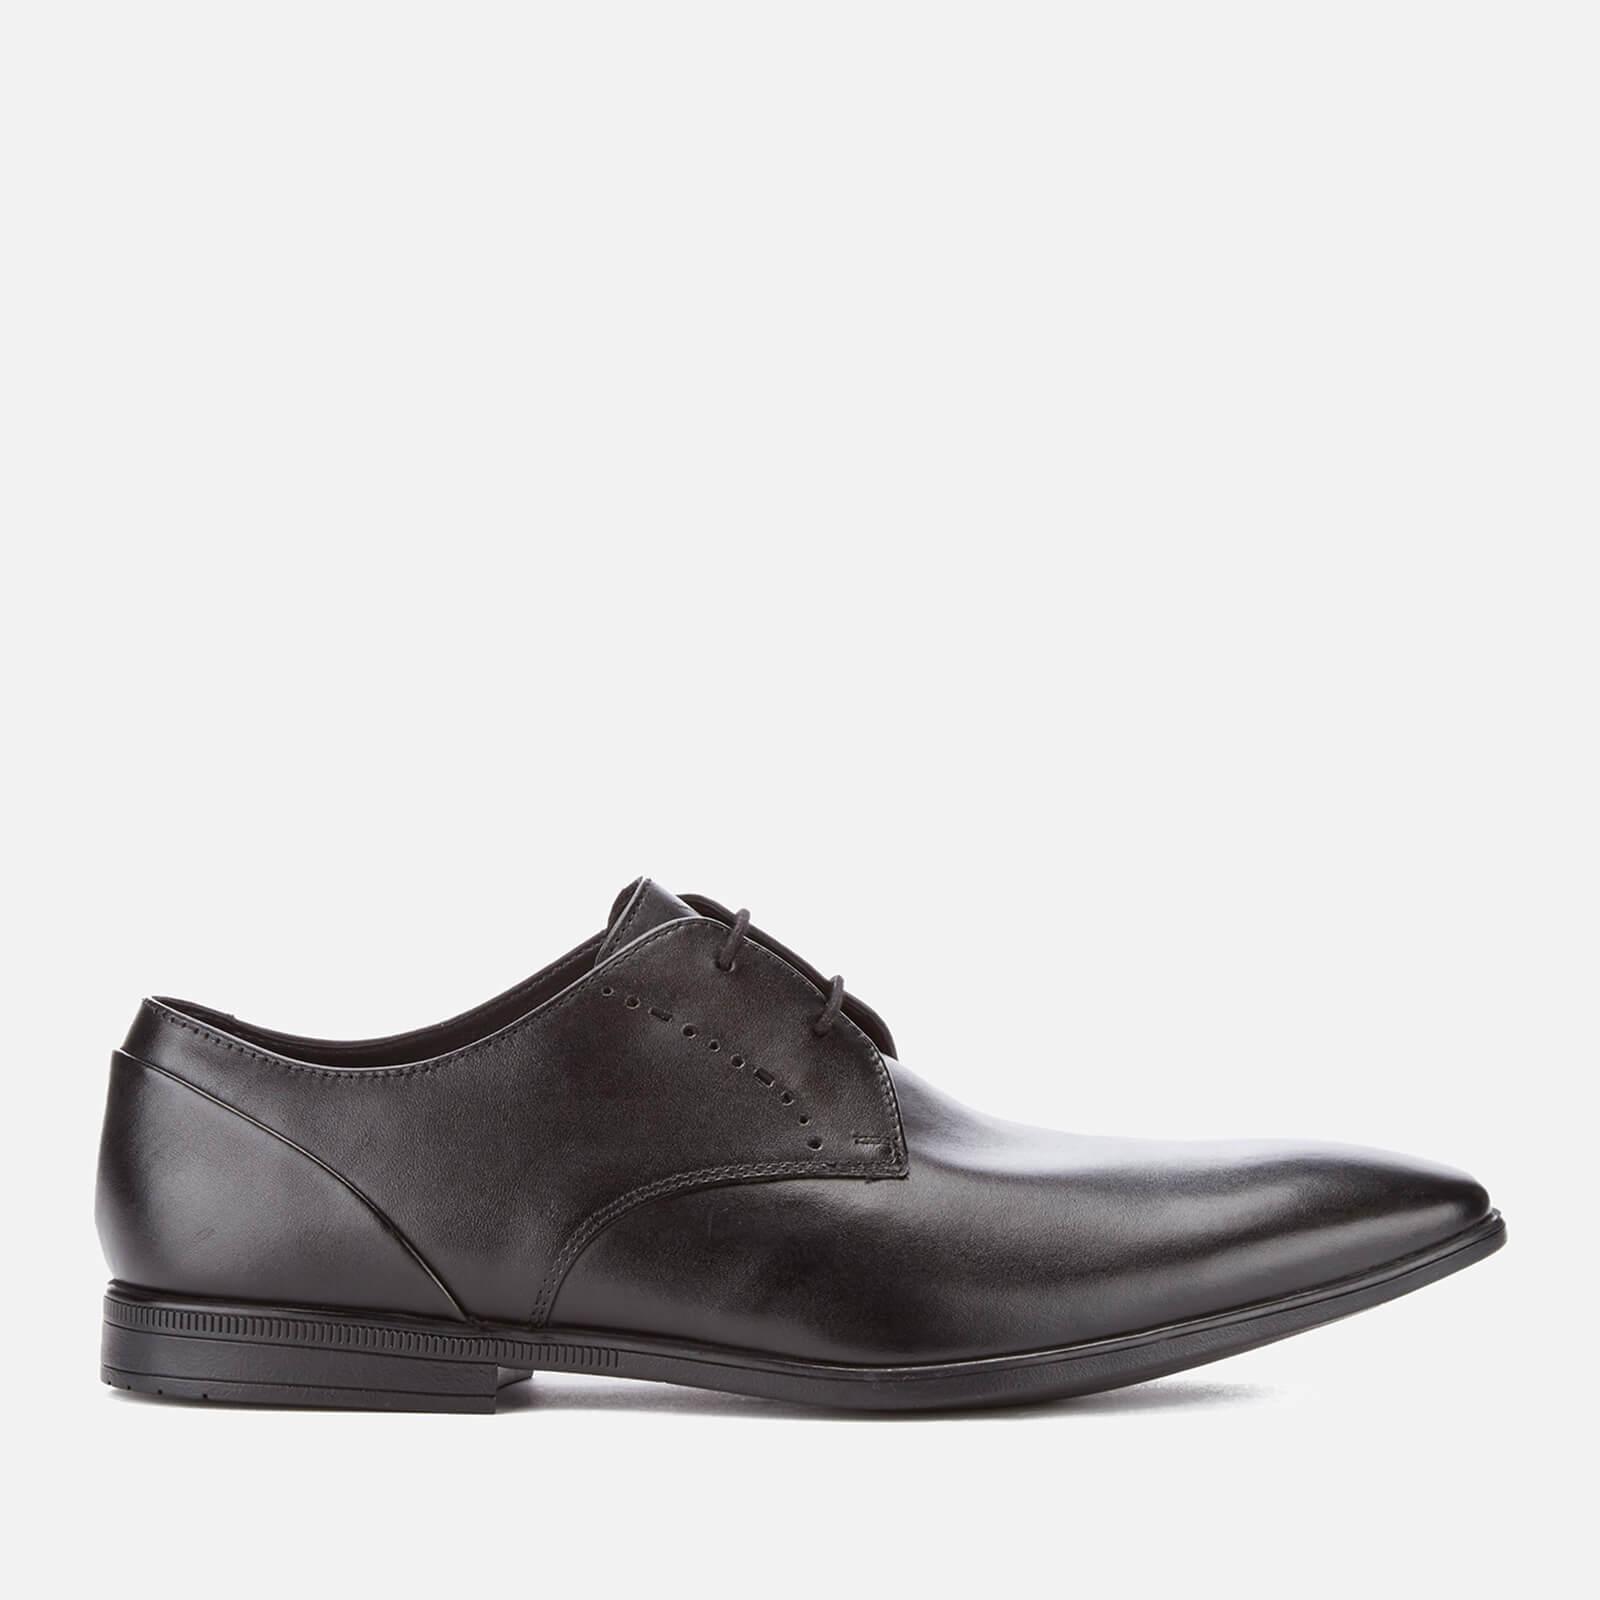 Clarks Men's Bampton Lace Leather Derby Shoes - Black - UK 11